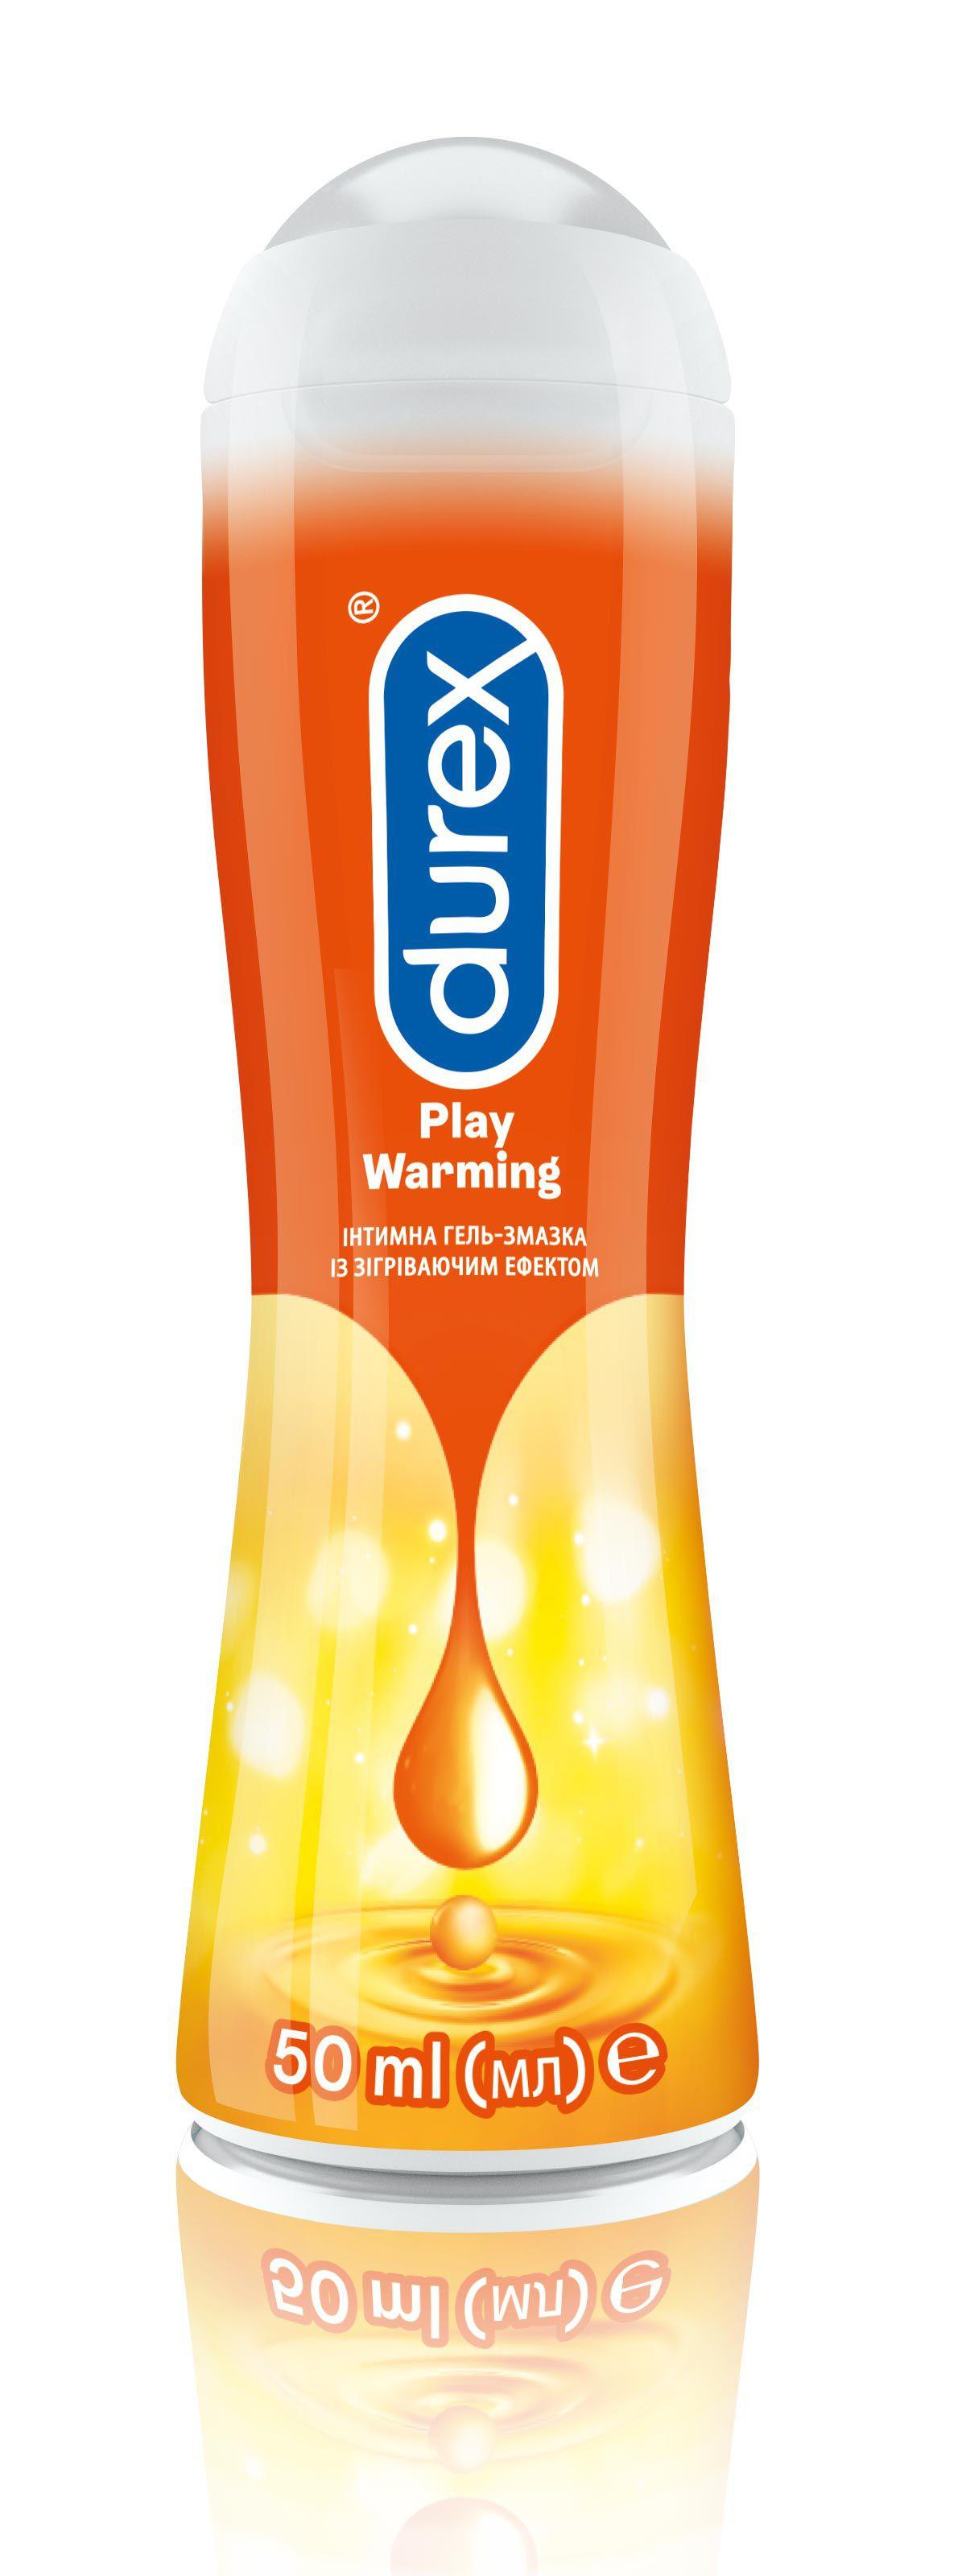 Intymna hel zmazka Durex Play Heat, 50ml